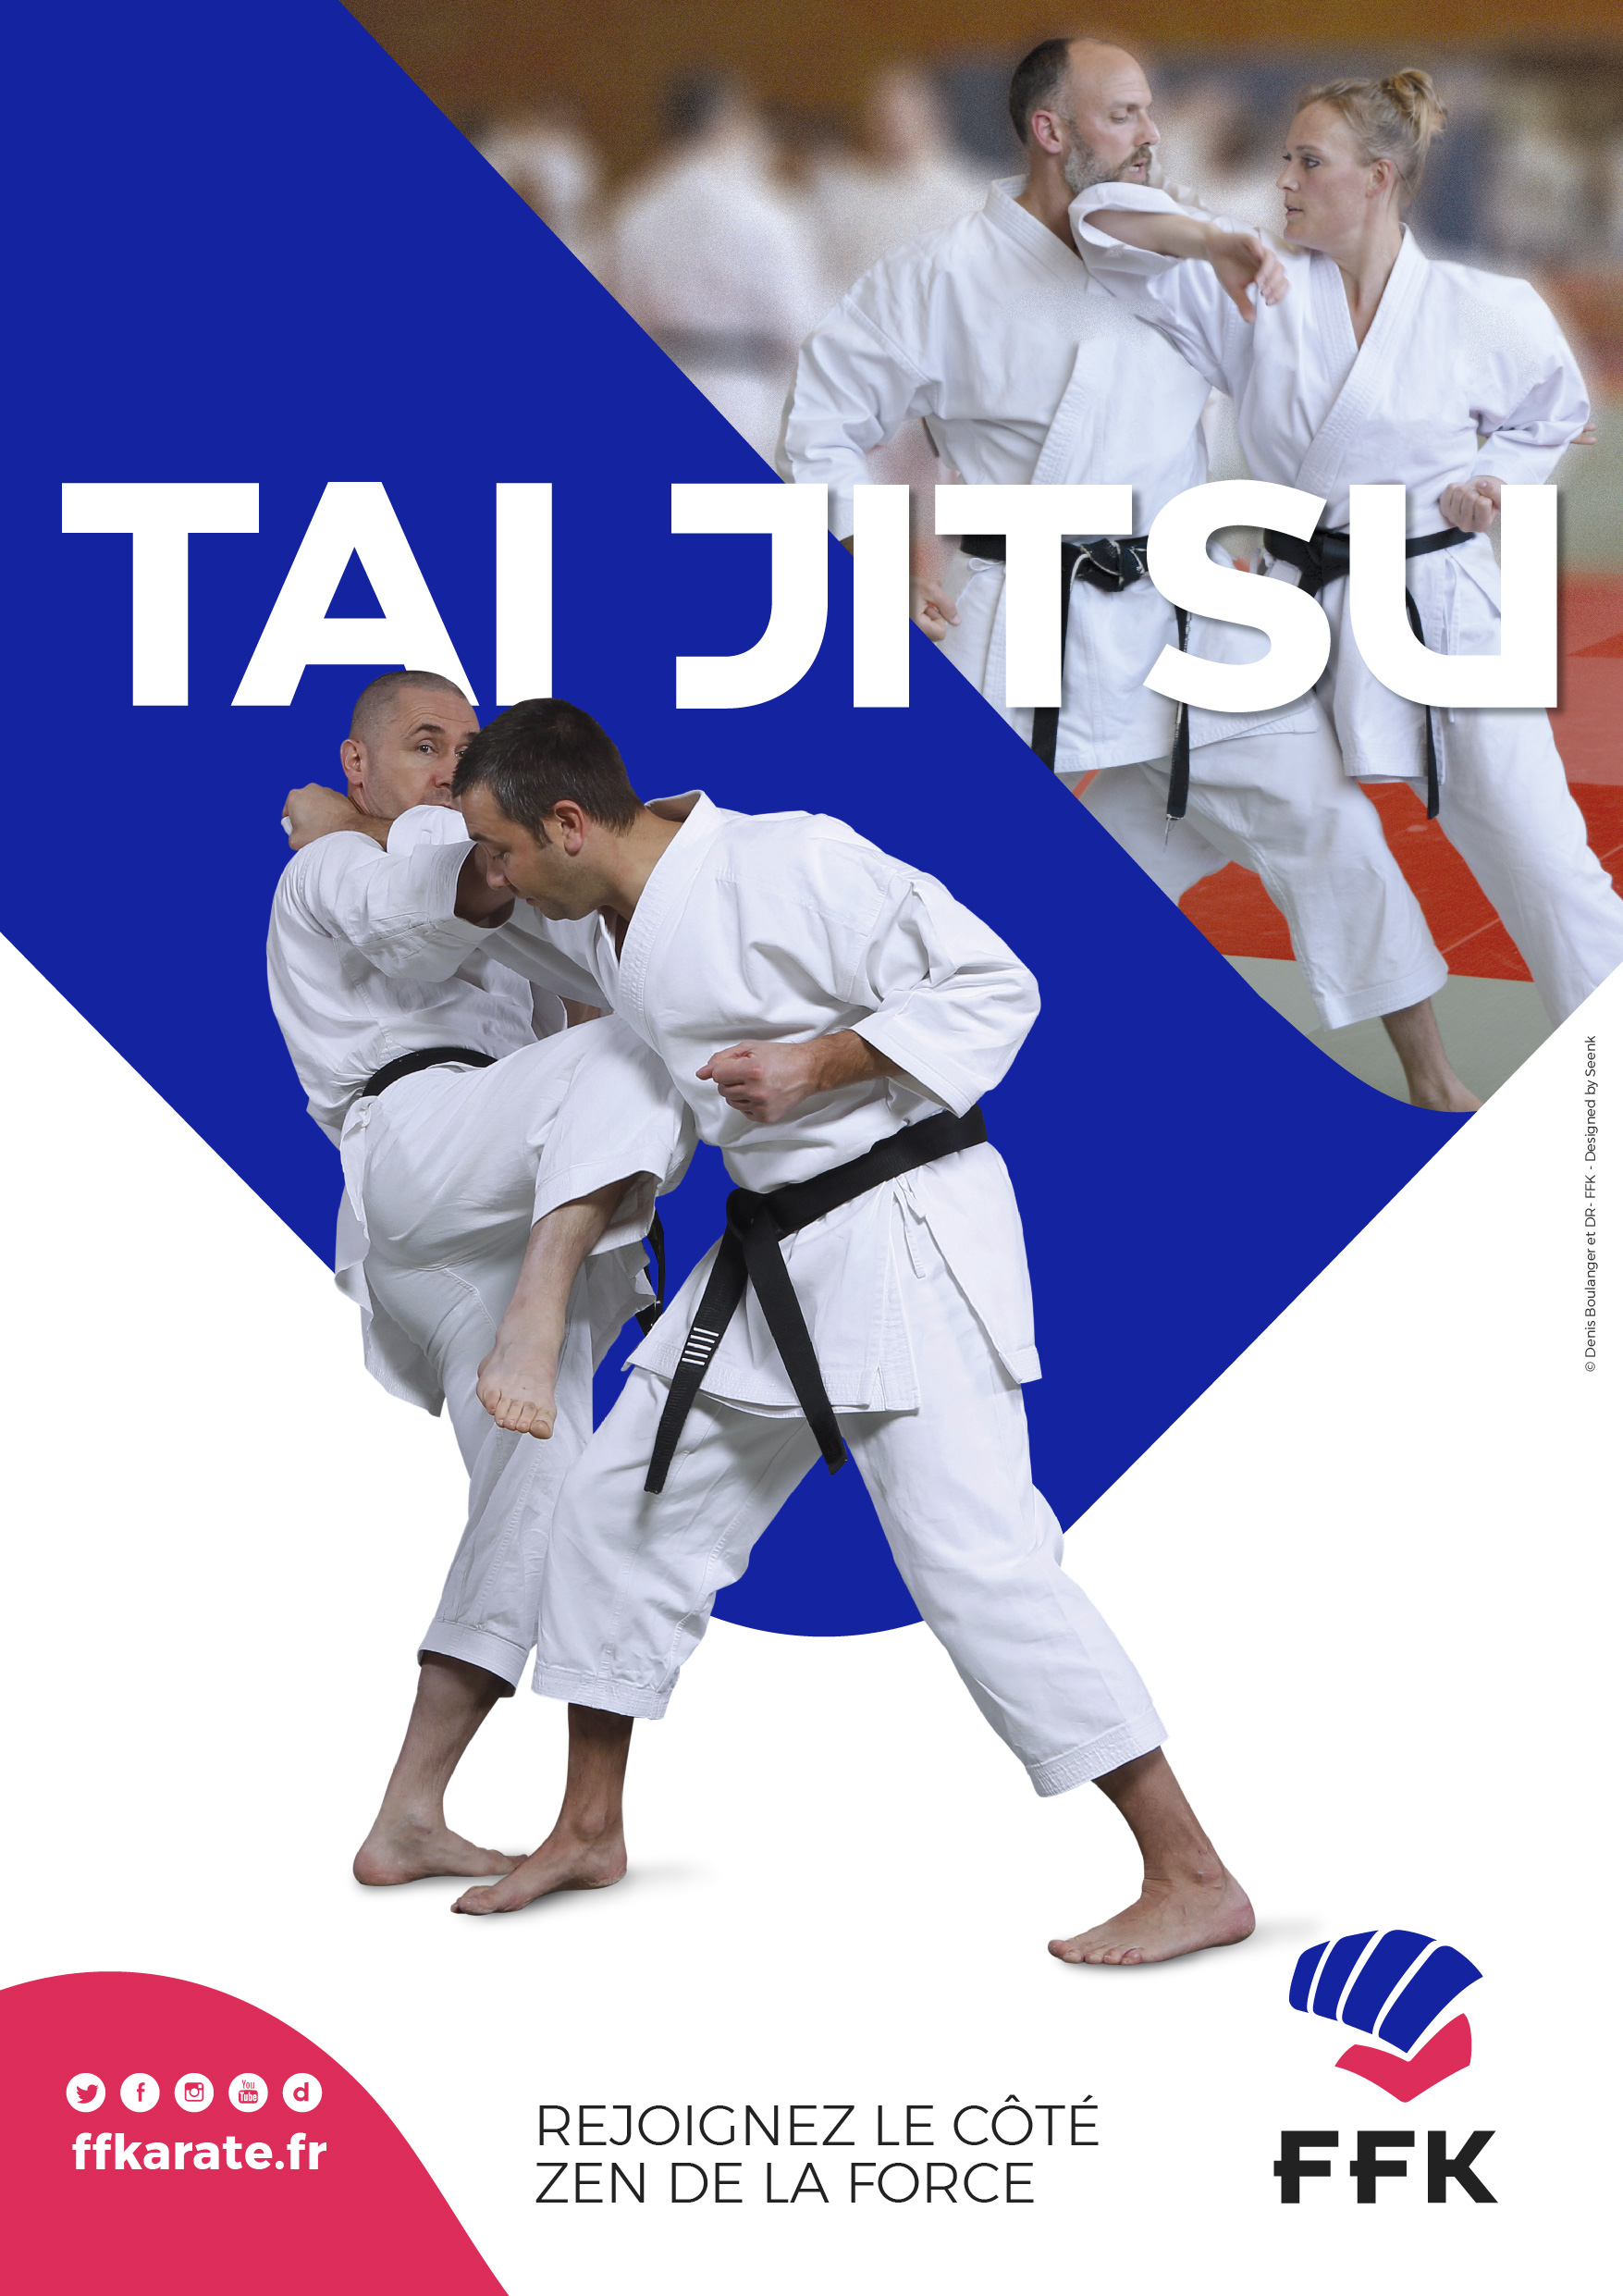 affiche Taijitsu